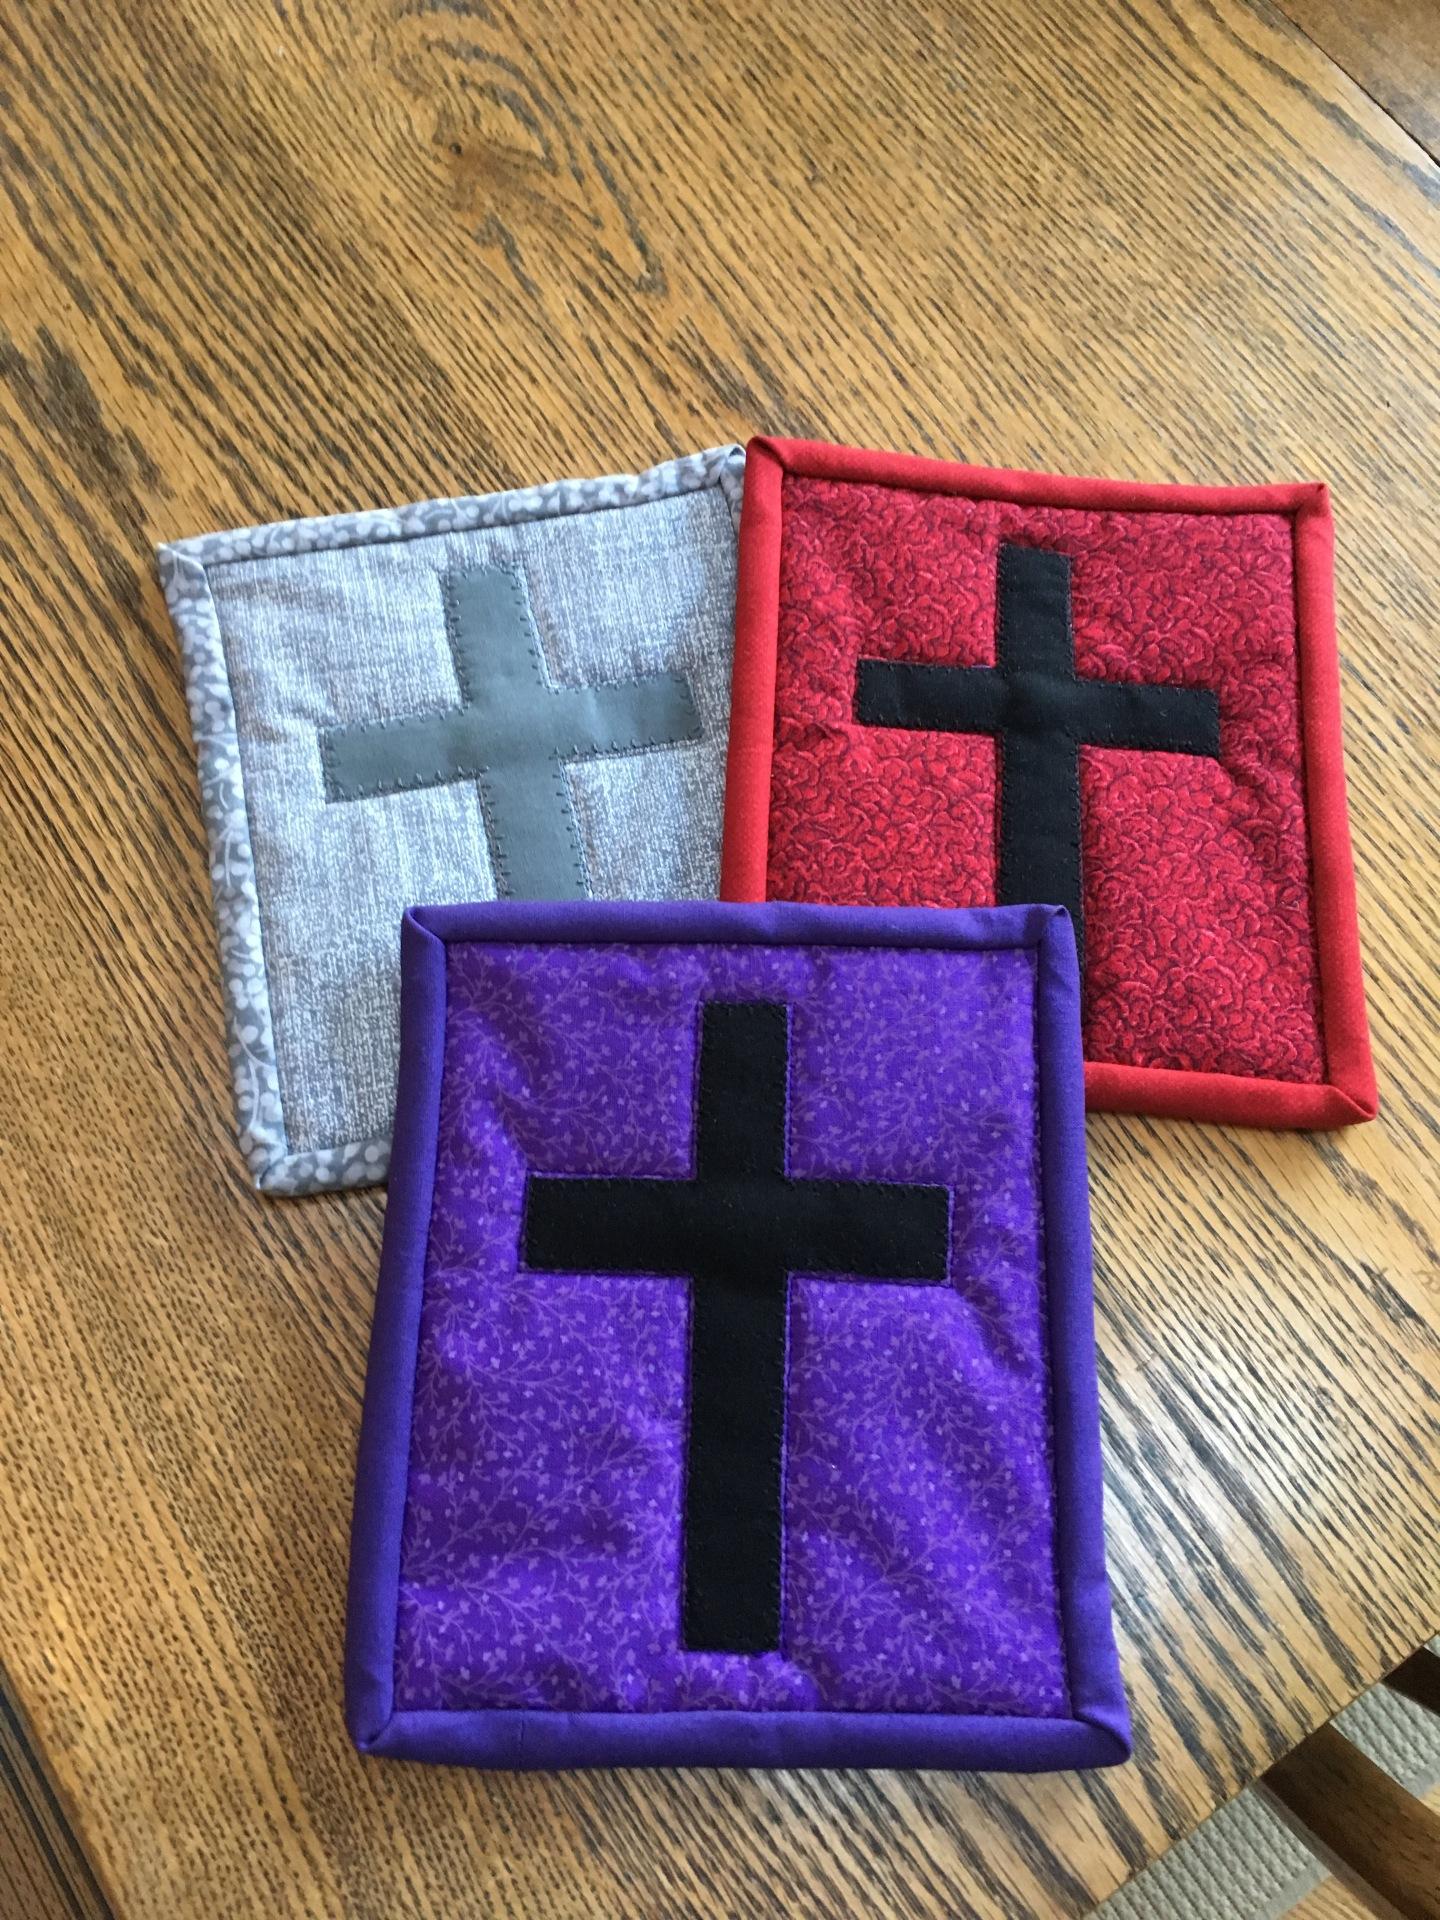 Cross stitched on bright fabric